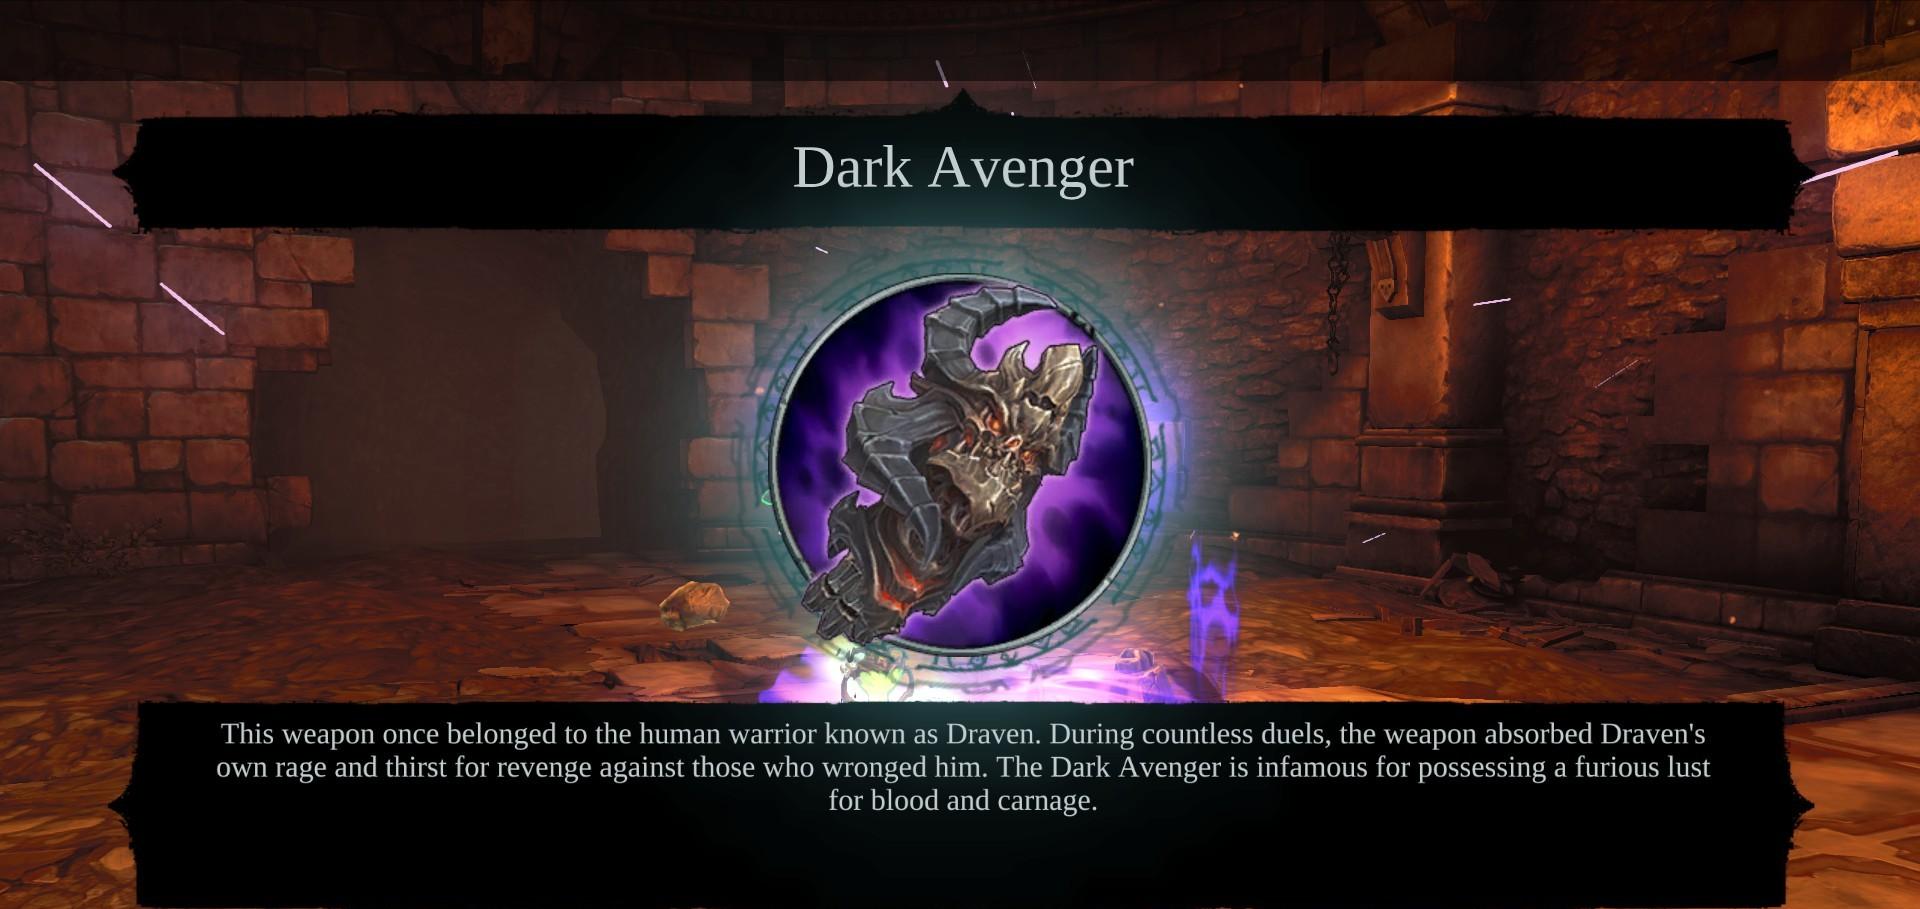 Darksiders 2 options binary jehovah cs go betting advice